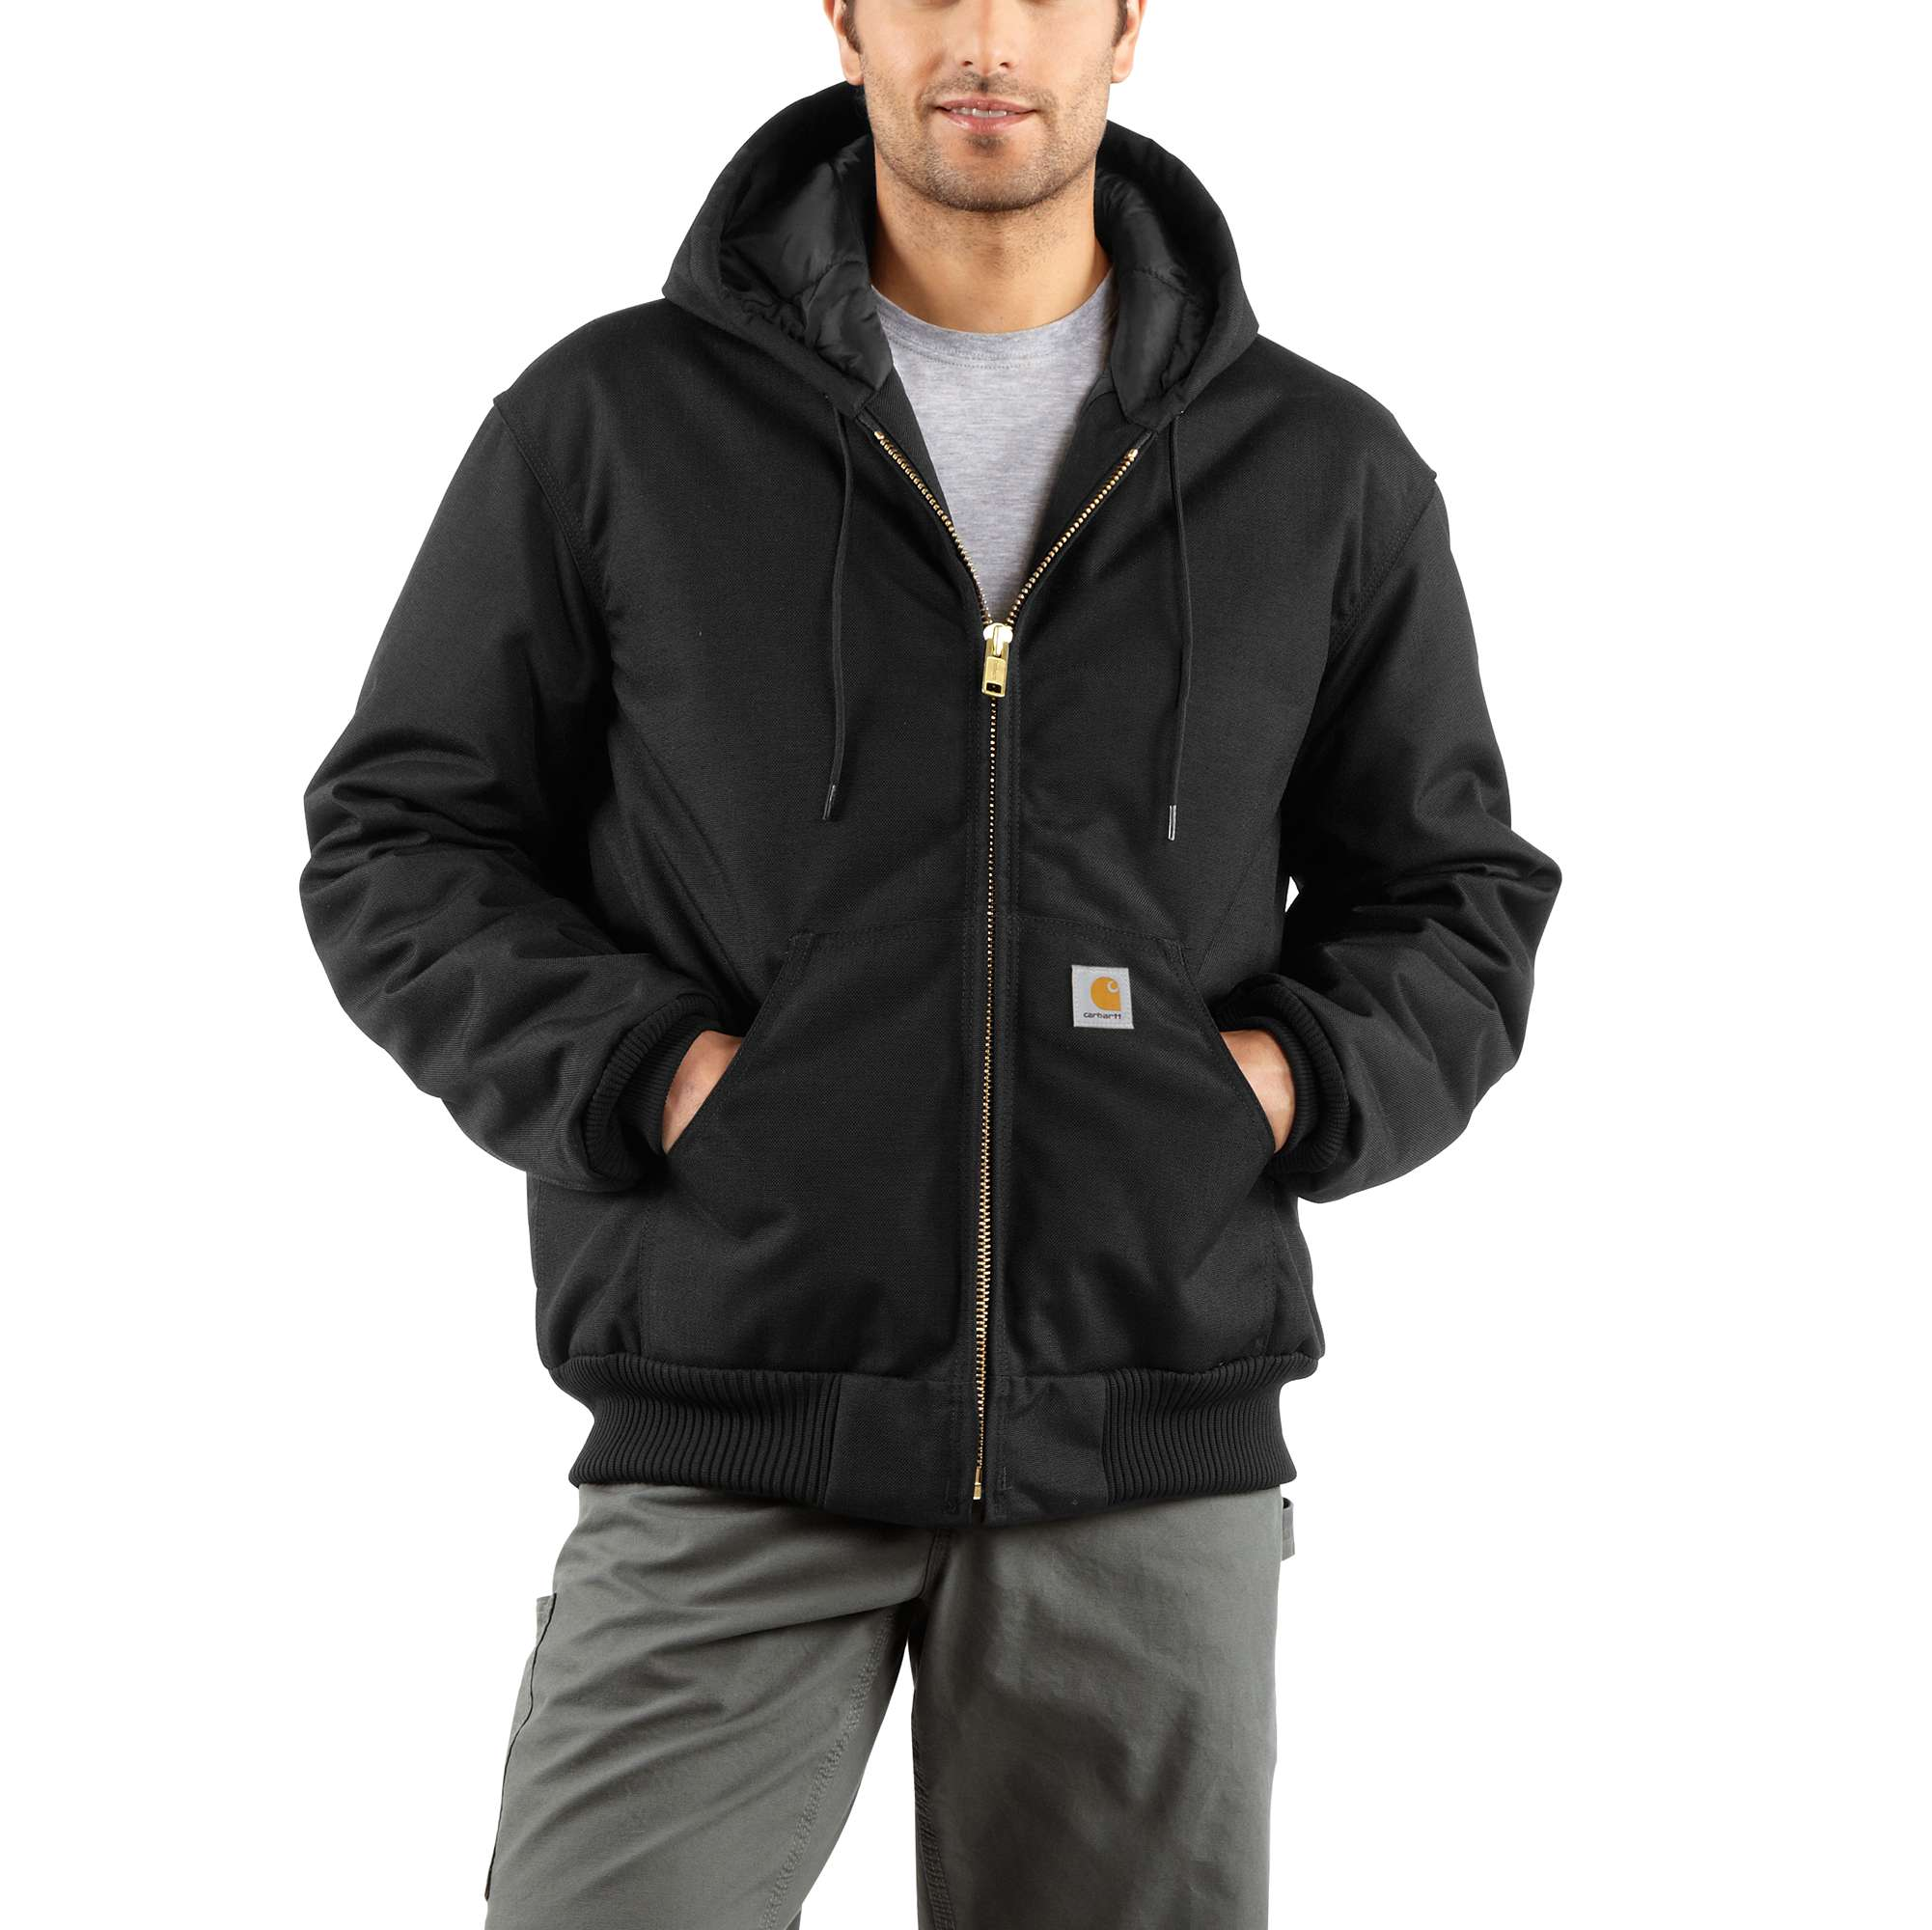 94ad953893960 Men's Yukon Extremes® Arctic-Quilt Active Jac J133 | Carhartt